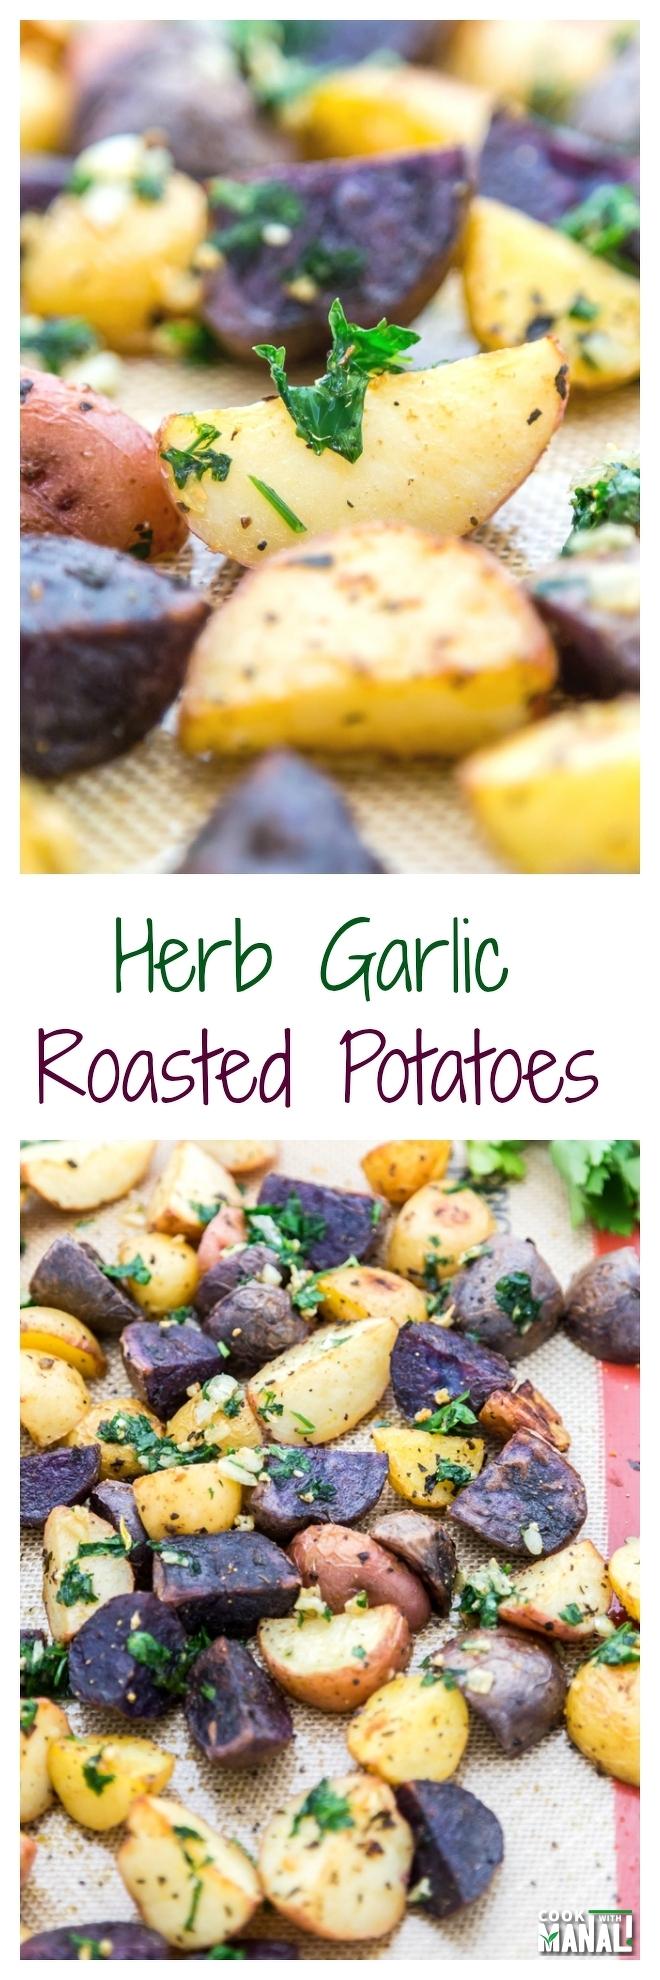 Herb Garlic Roasted Potatoes Collage